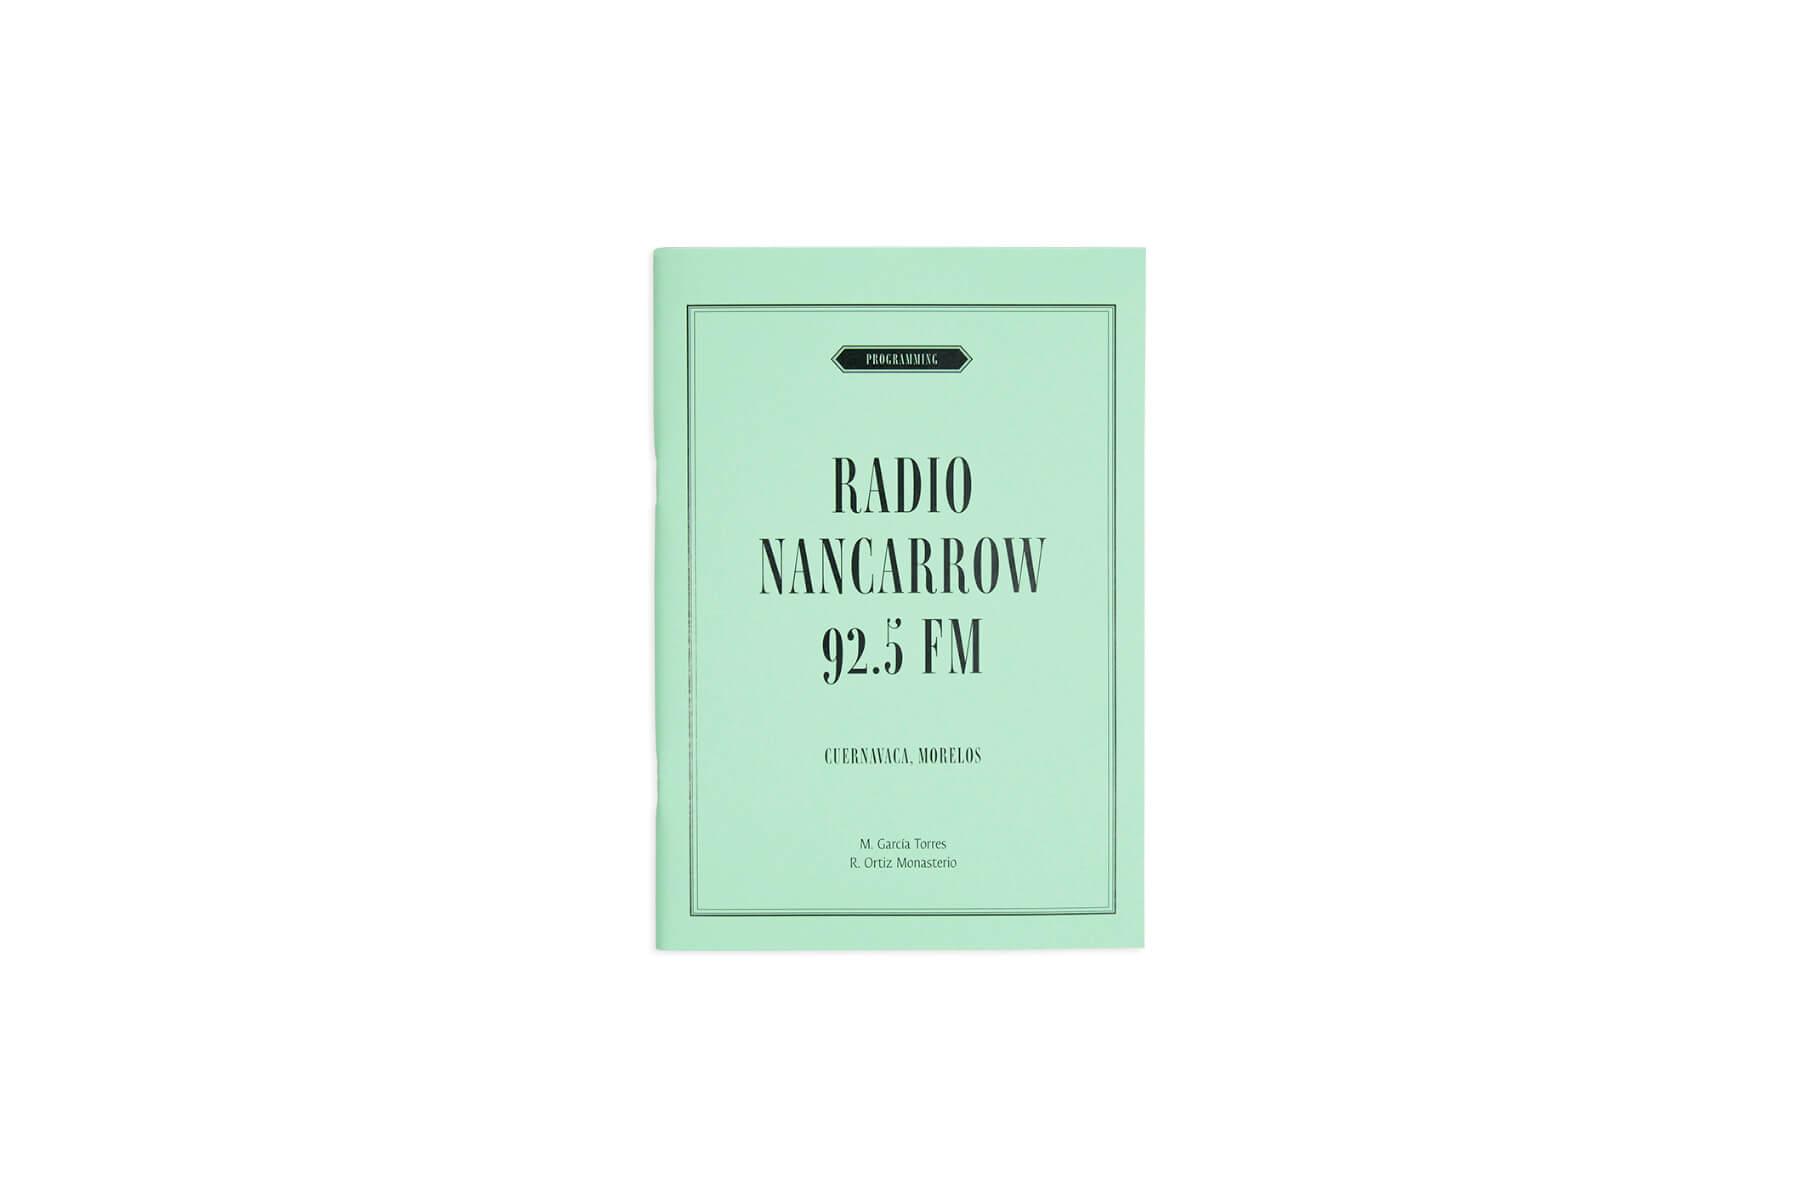 Product image of Radio Nancarrow 92.5 FM